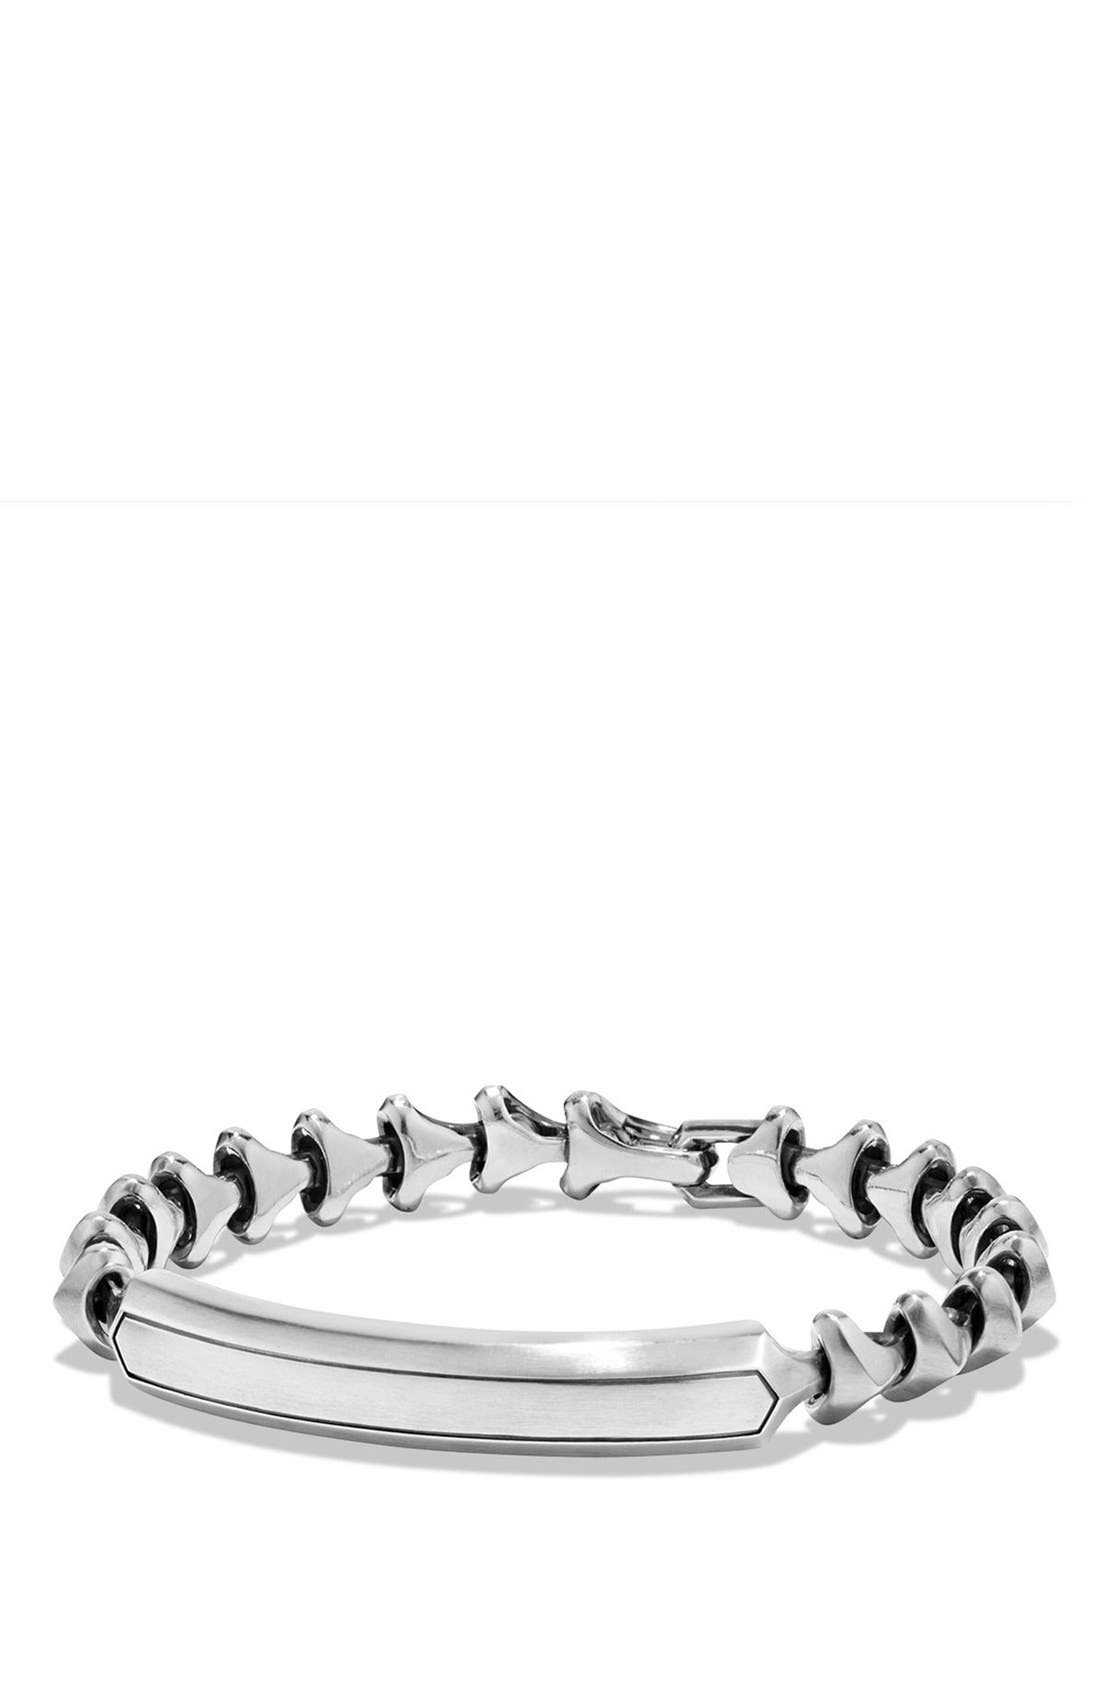 Main Image - David Yurman 'Armory' Single Row ID Bracelet